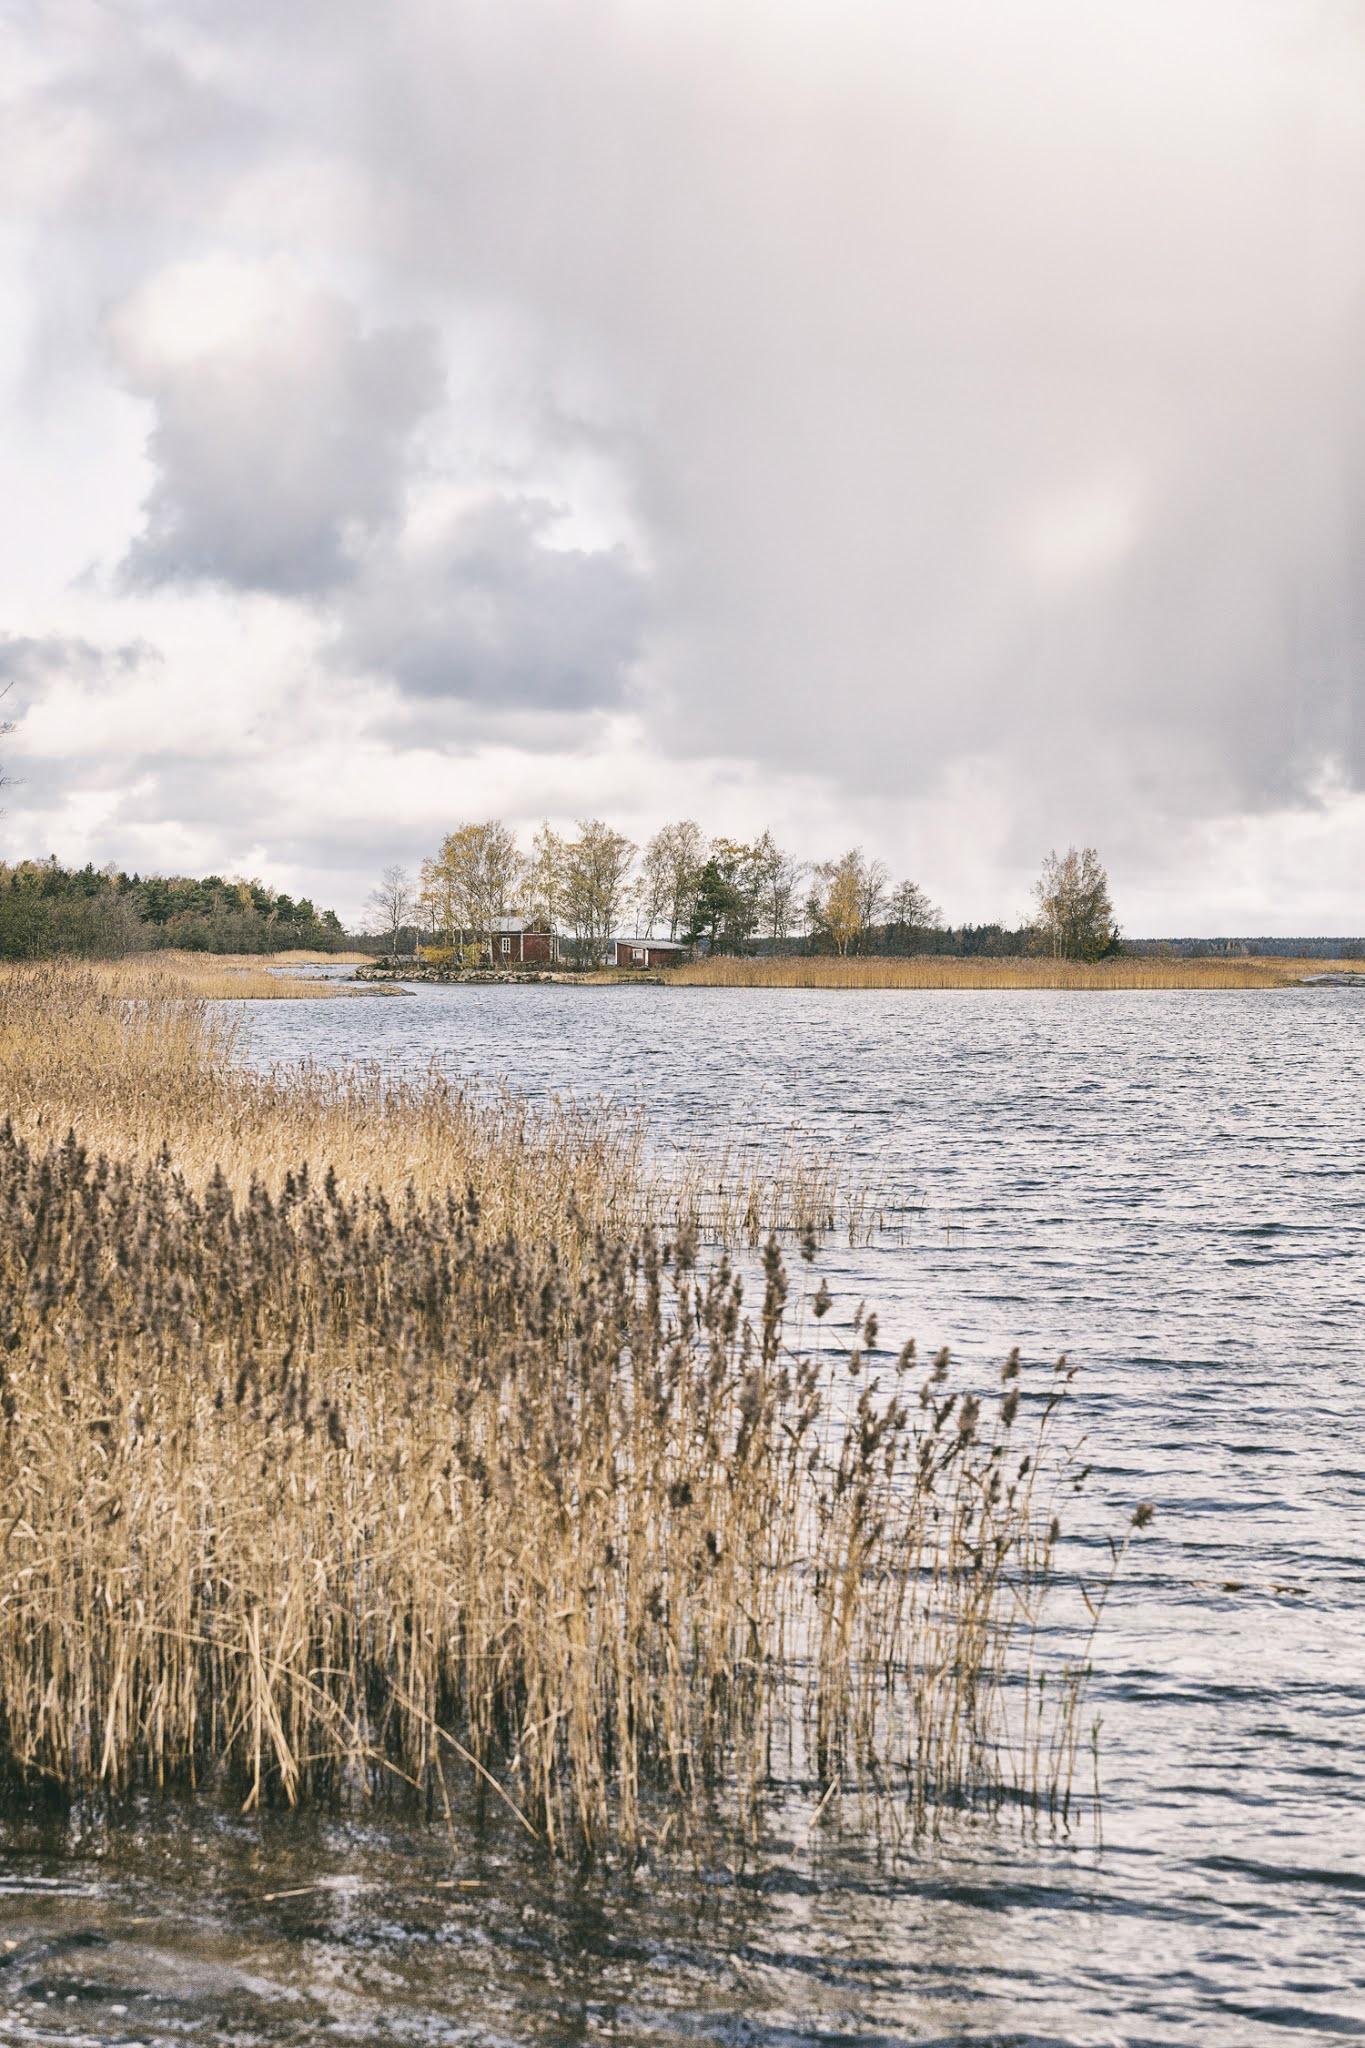 Rauma, Visitrauma, visitfinland, Finland, Satakunta, valokuvaaja, photographer, Frida Steiner, Visualaddict, Visualaddictfrida, blogi, valokuvausblogi, bloggaaja,